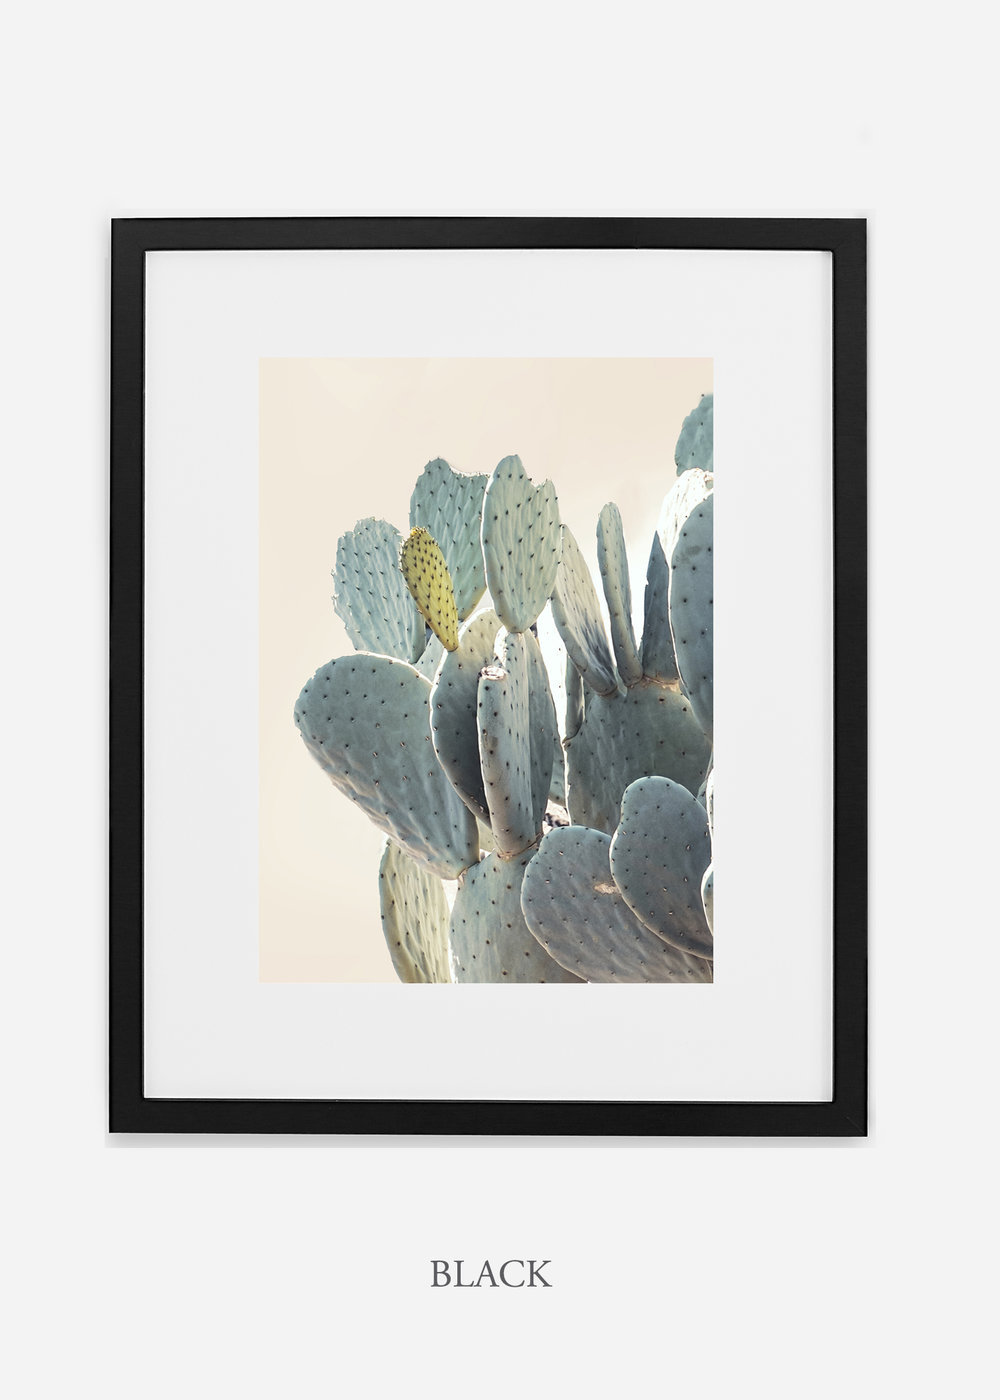 Desert_blackframe_DesertDetails_Cactus__Art_Photography_interiordesign_bohemian_cactusart.jpg